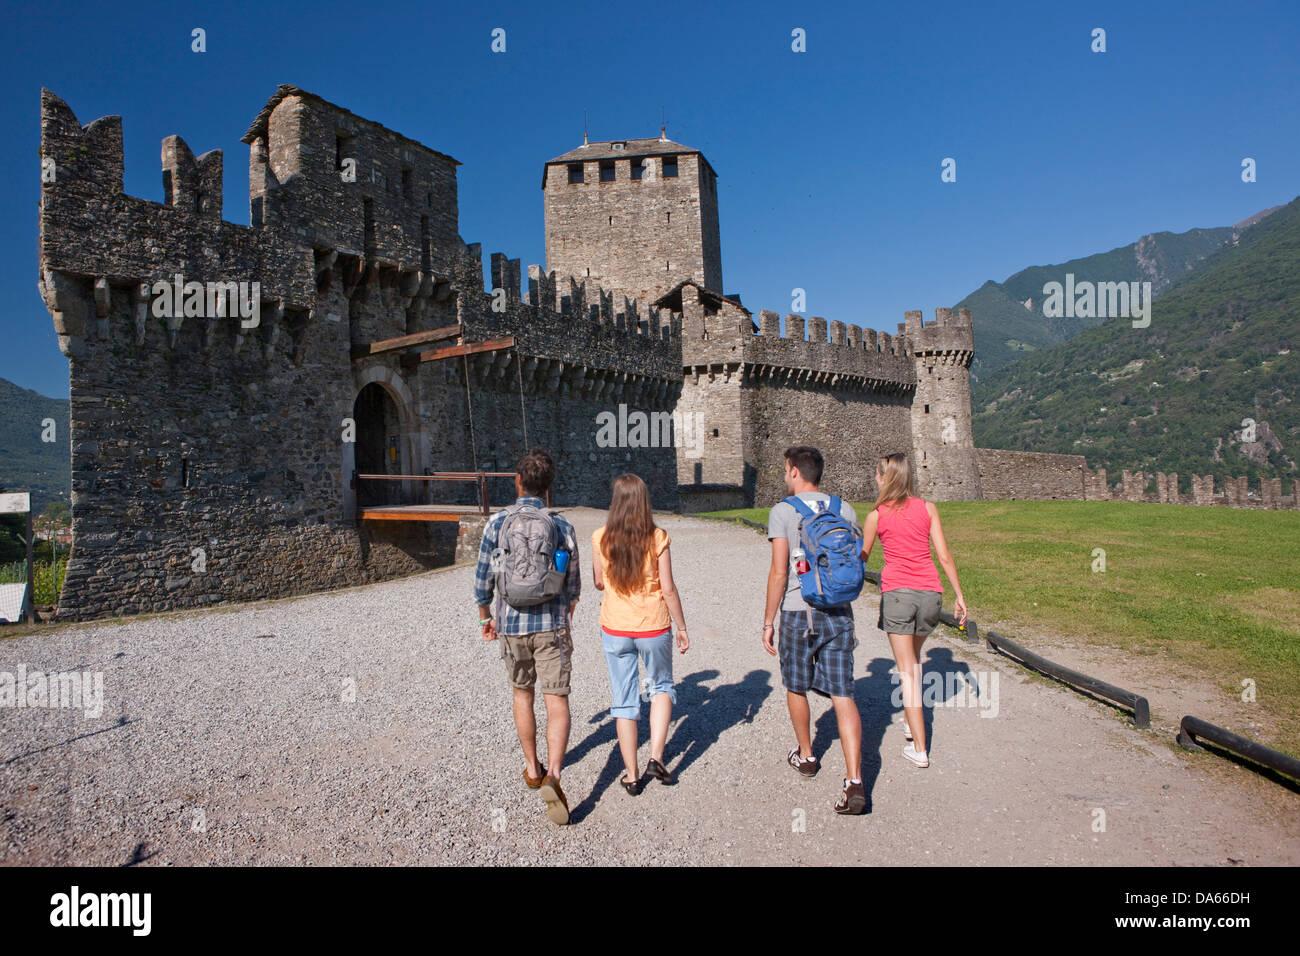 Tourists, Monte Bello, visit, building, construction, Castle, tourism, holidays, canton, TI, Ticino, South Switzerland, Stock Photo